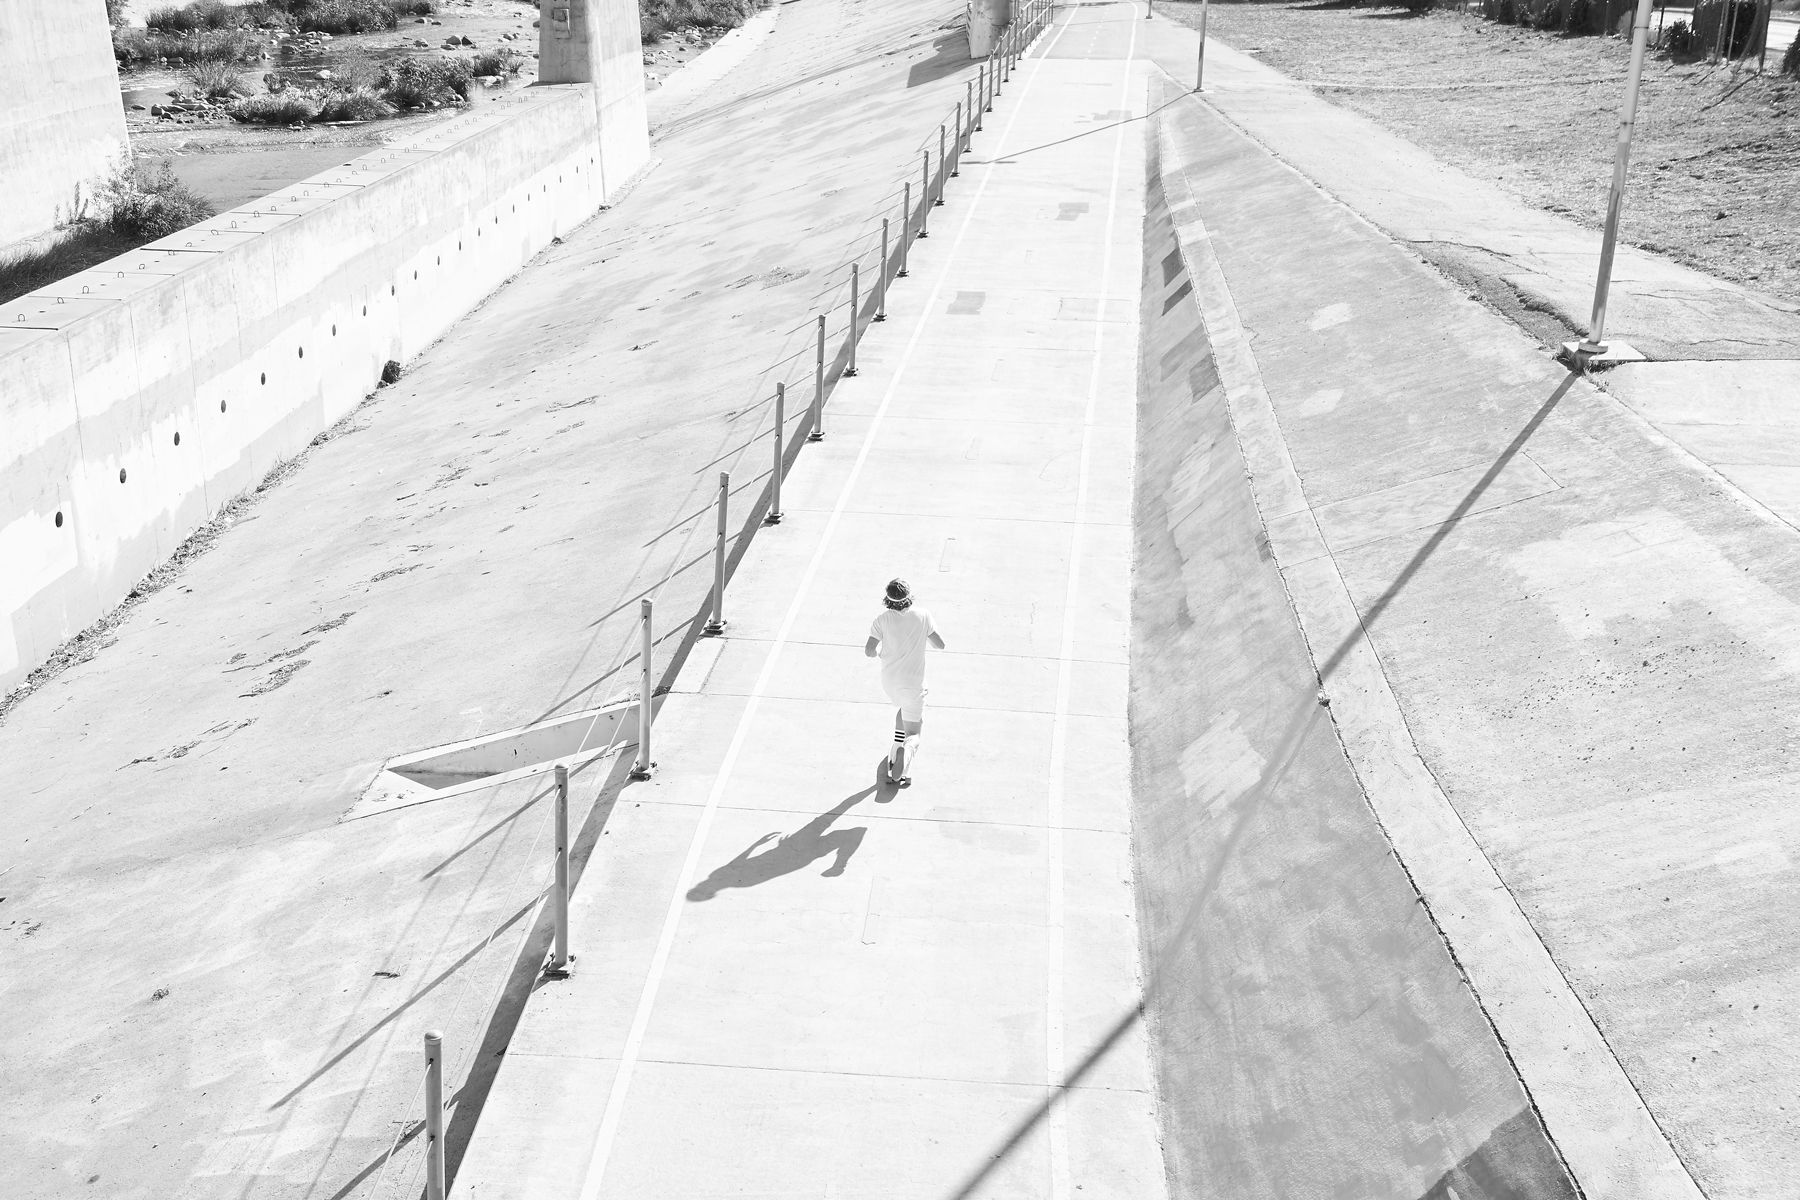 1r20151211_skateboarding_tomryen_0002_1.jpg